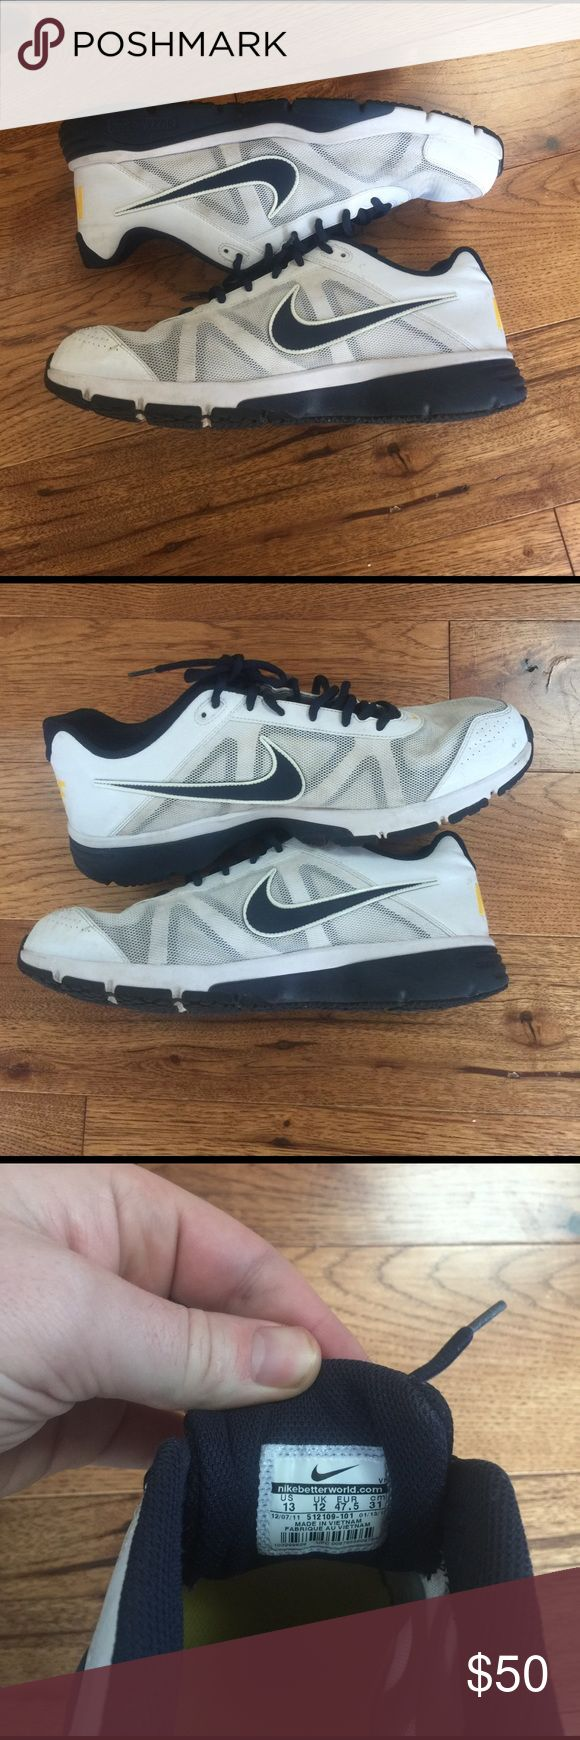 Nike Dual Fusion TR III Training Sneaker Size 13 Nike Dual Fusion TR III Training Sneaker Size 13. Like new. Worn maybe twice. Nike Shoes Sneakers